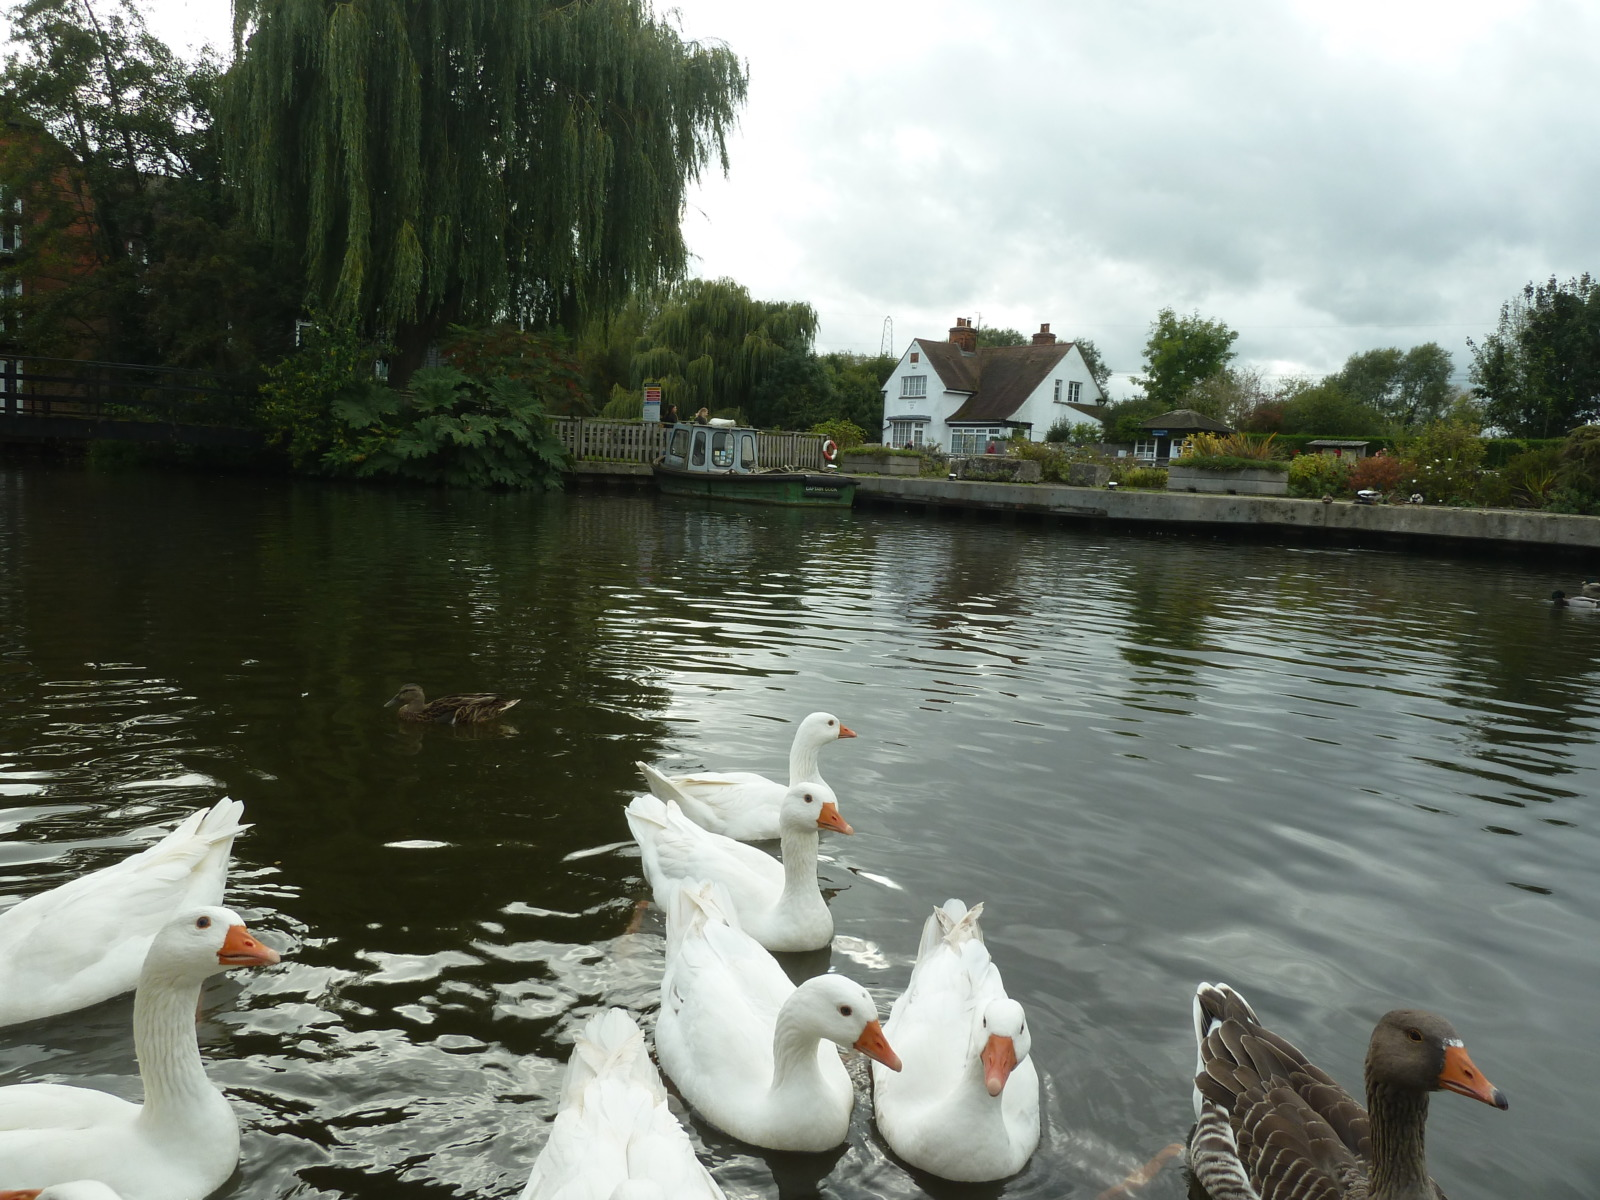 Ducks at Sandford Lock